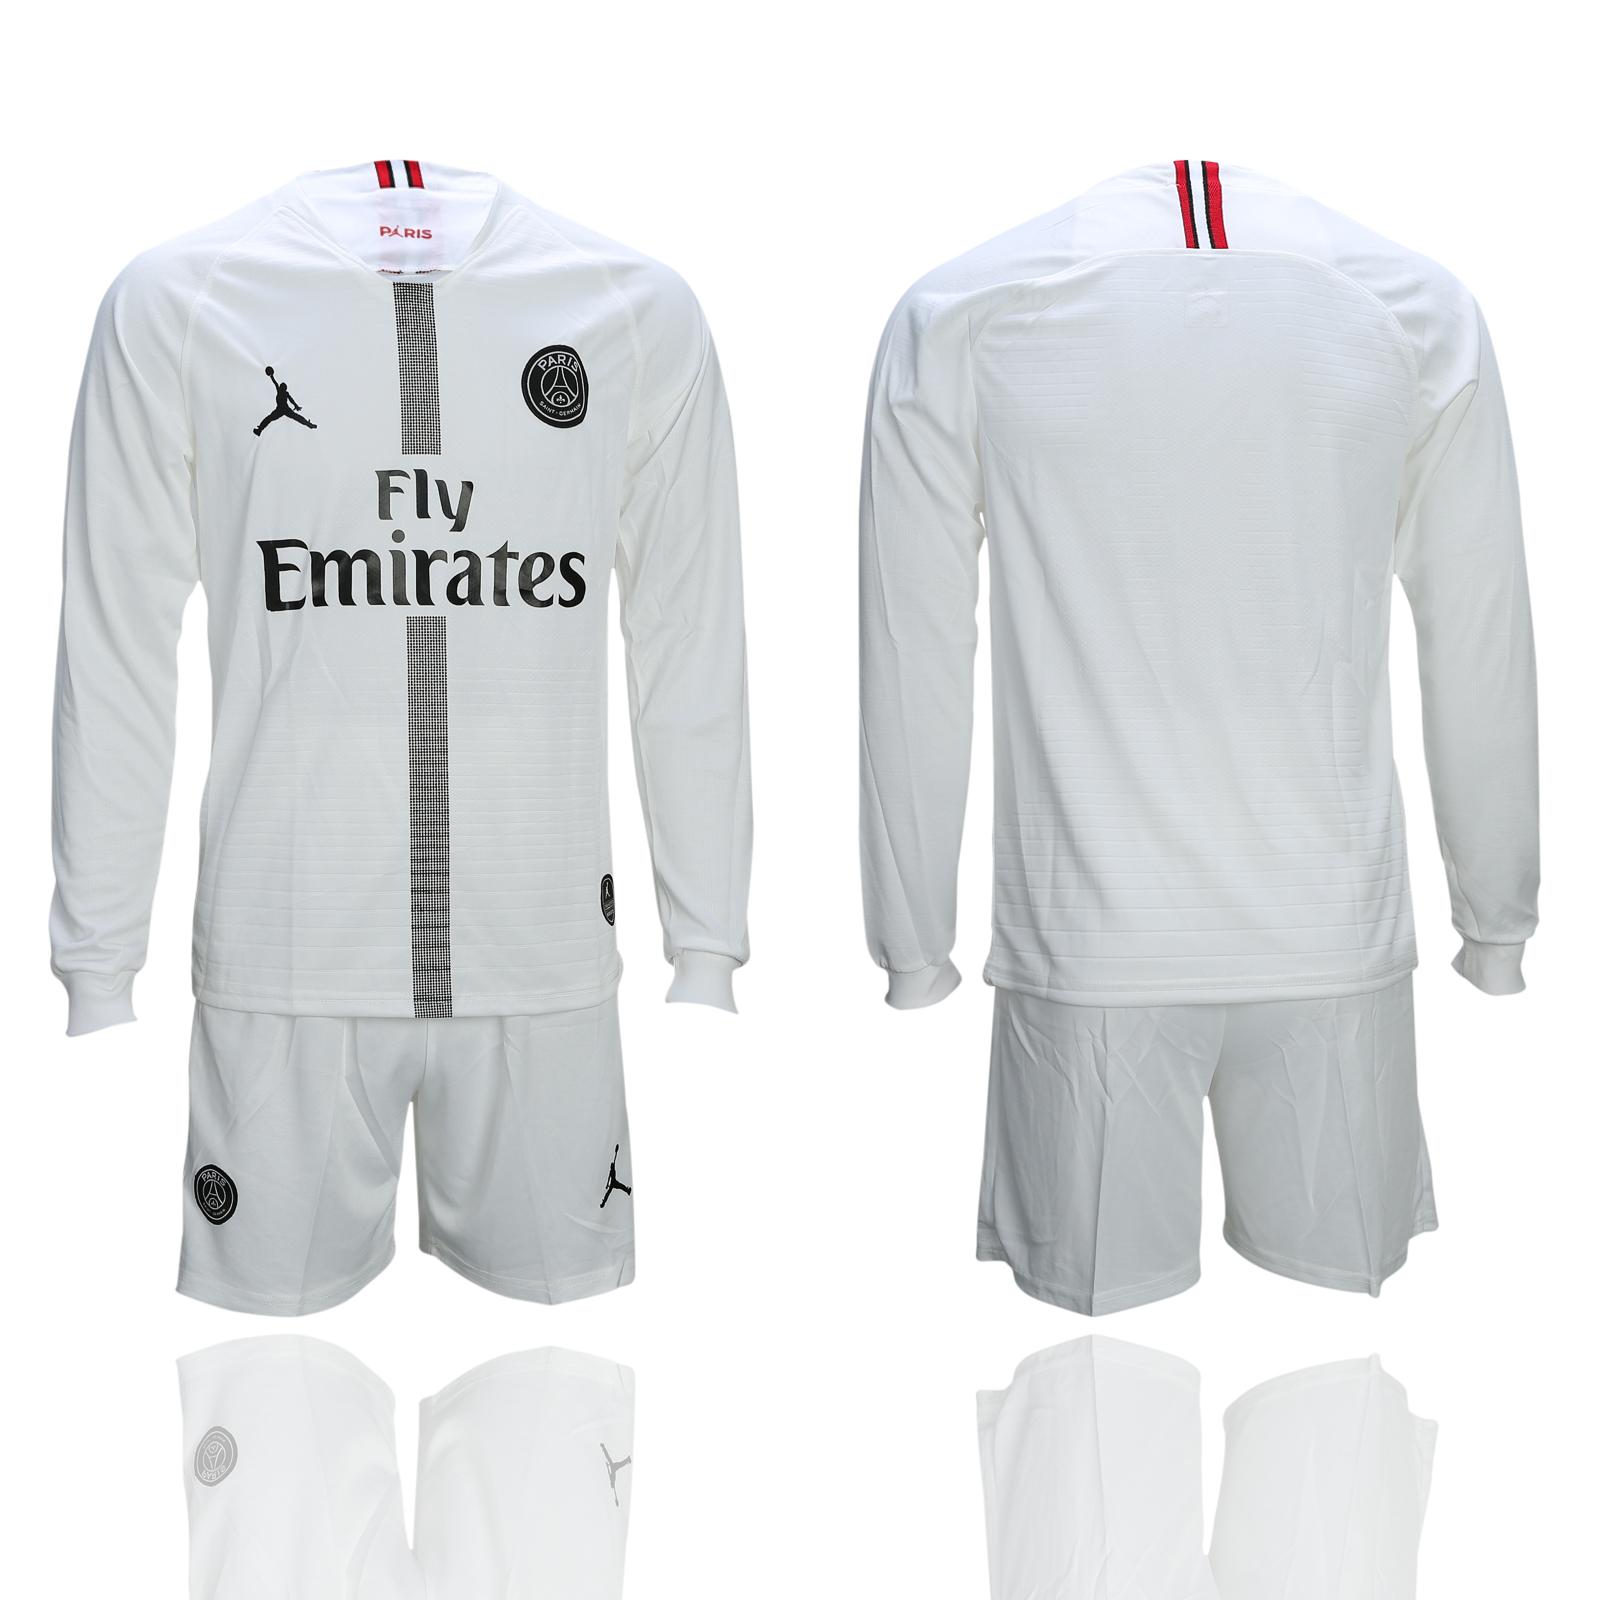 2018-19 Paris Saint-Germain White UEFA Champions League Long Sleeve Soccer Jersey